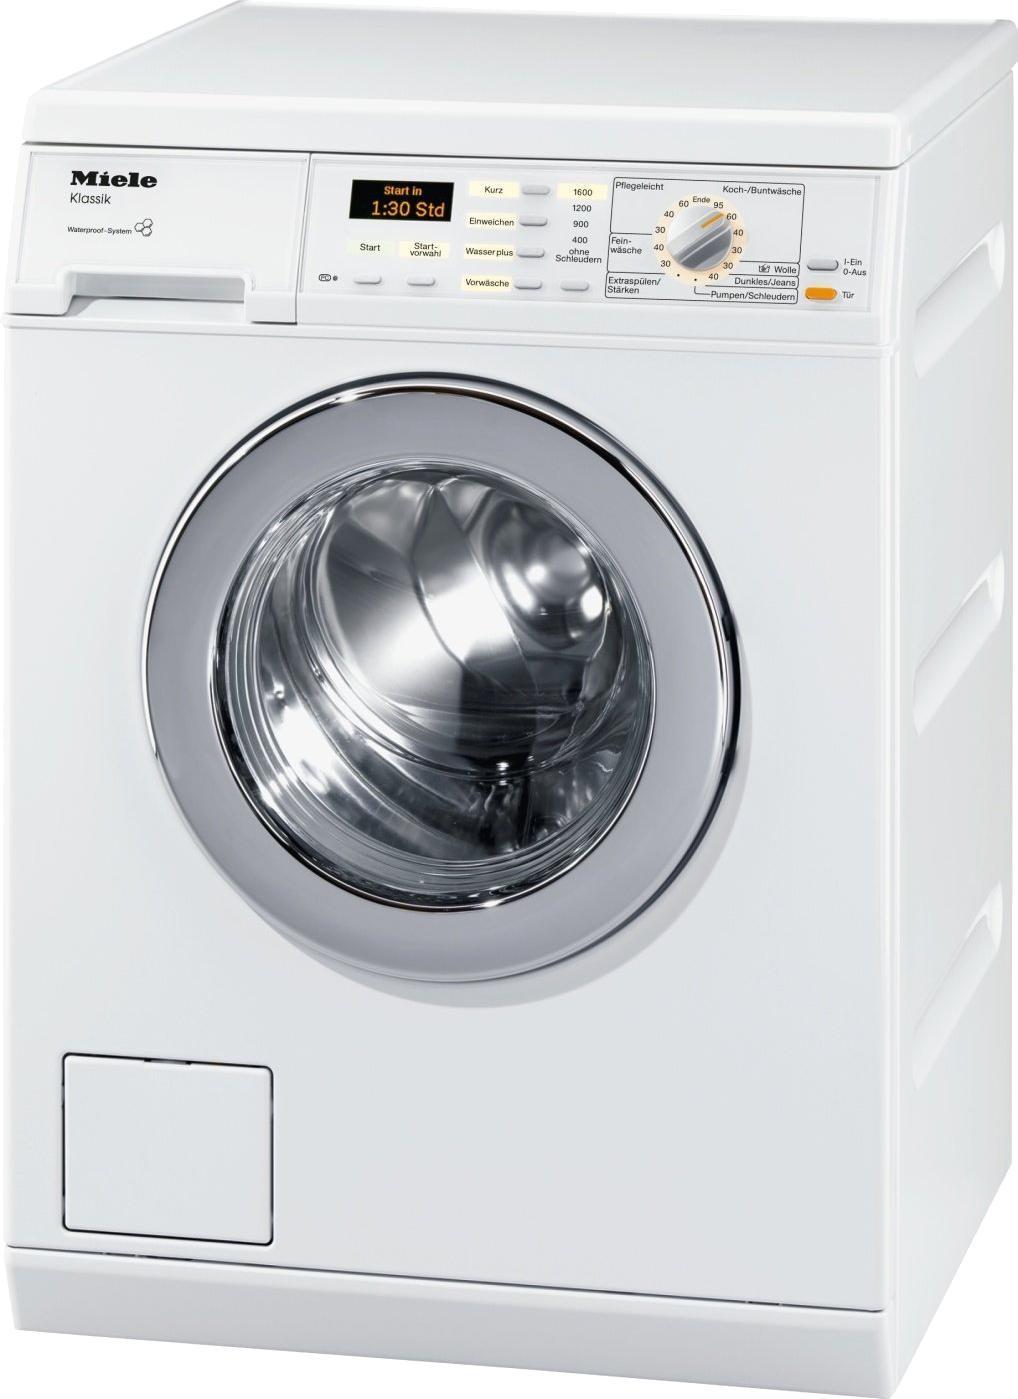 miele w 5873 wps vs miele w 5903 wps compara lavadoras. Black Bedroom Furniture Sets. Home Design Ideas